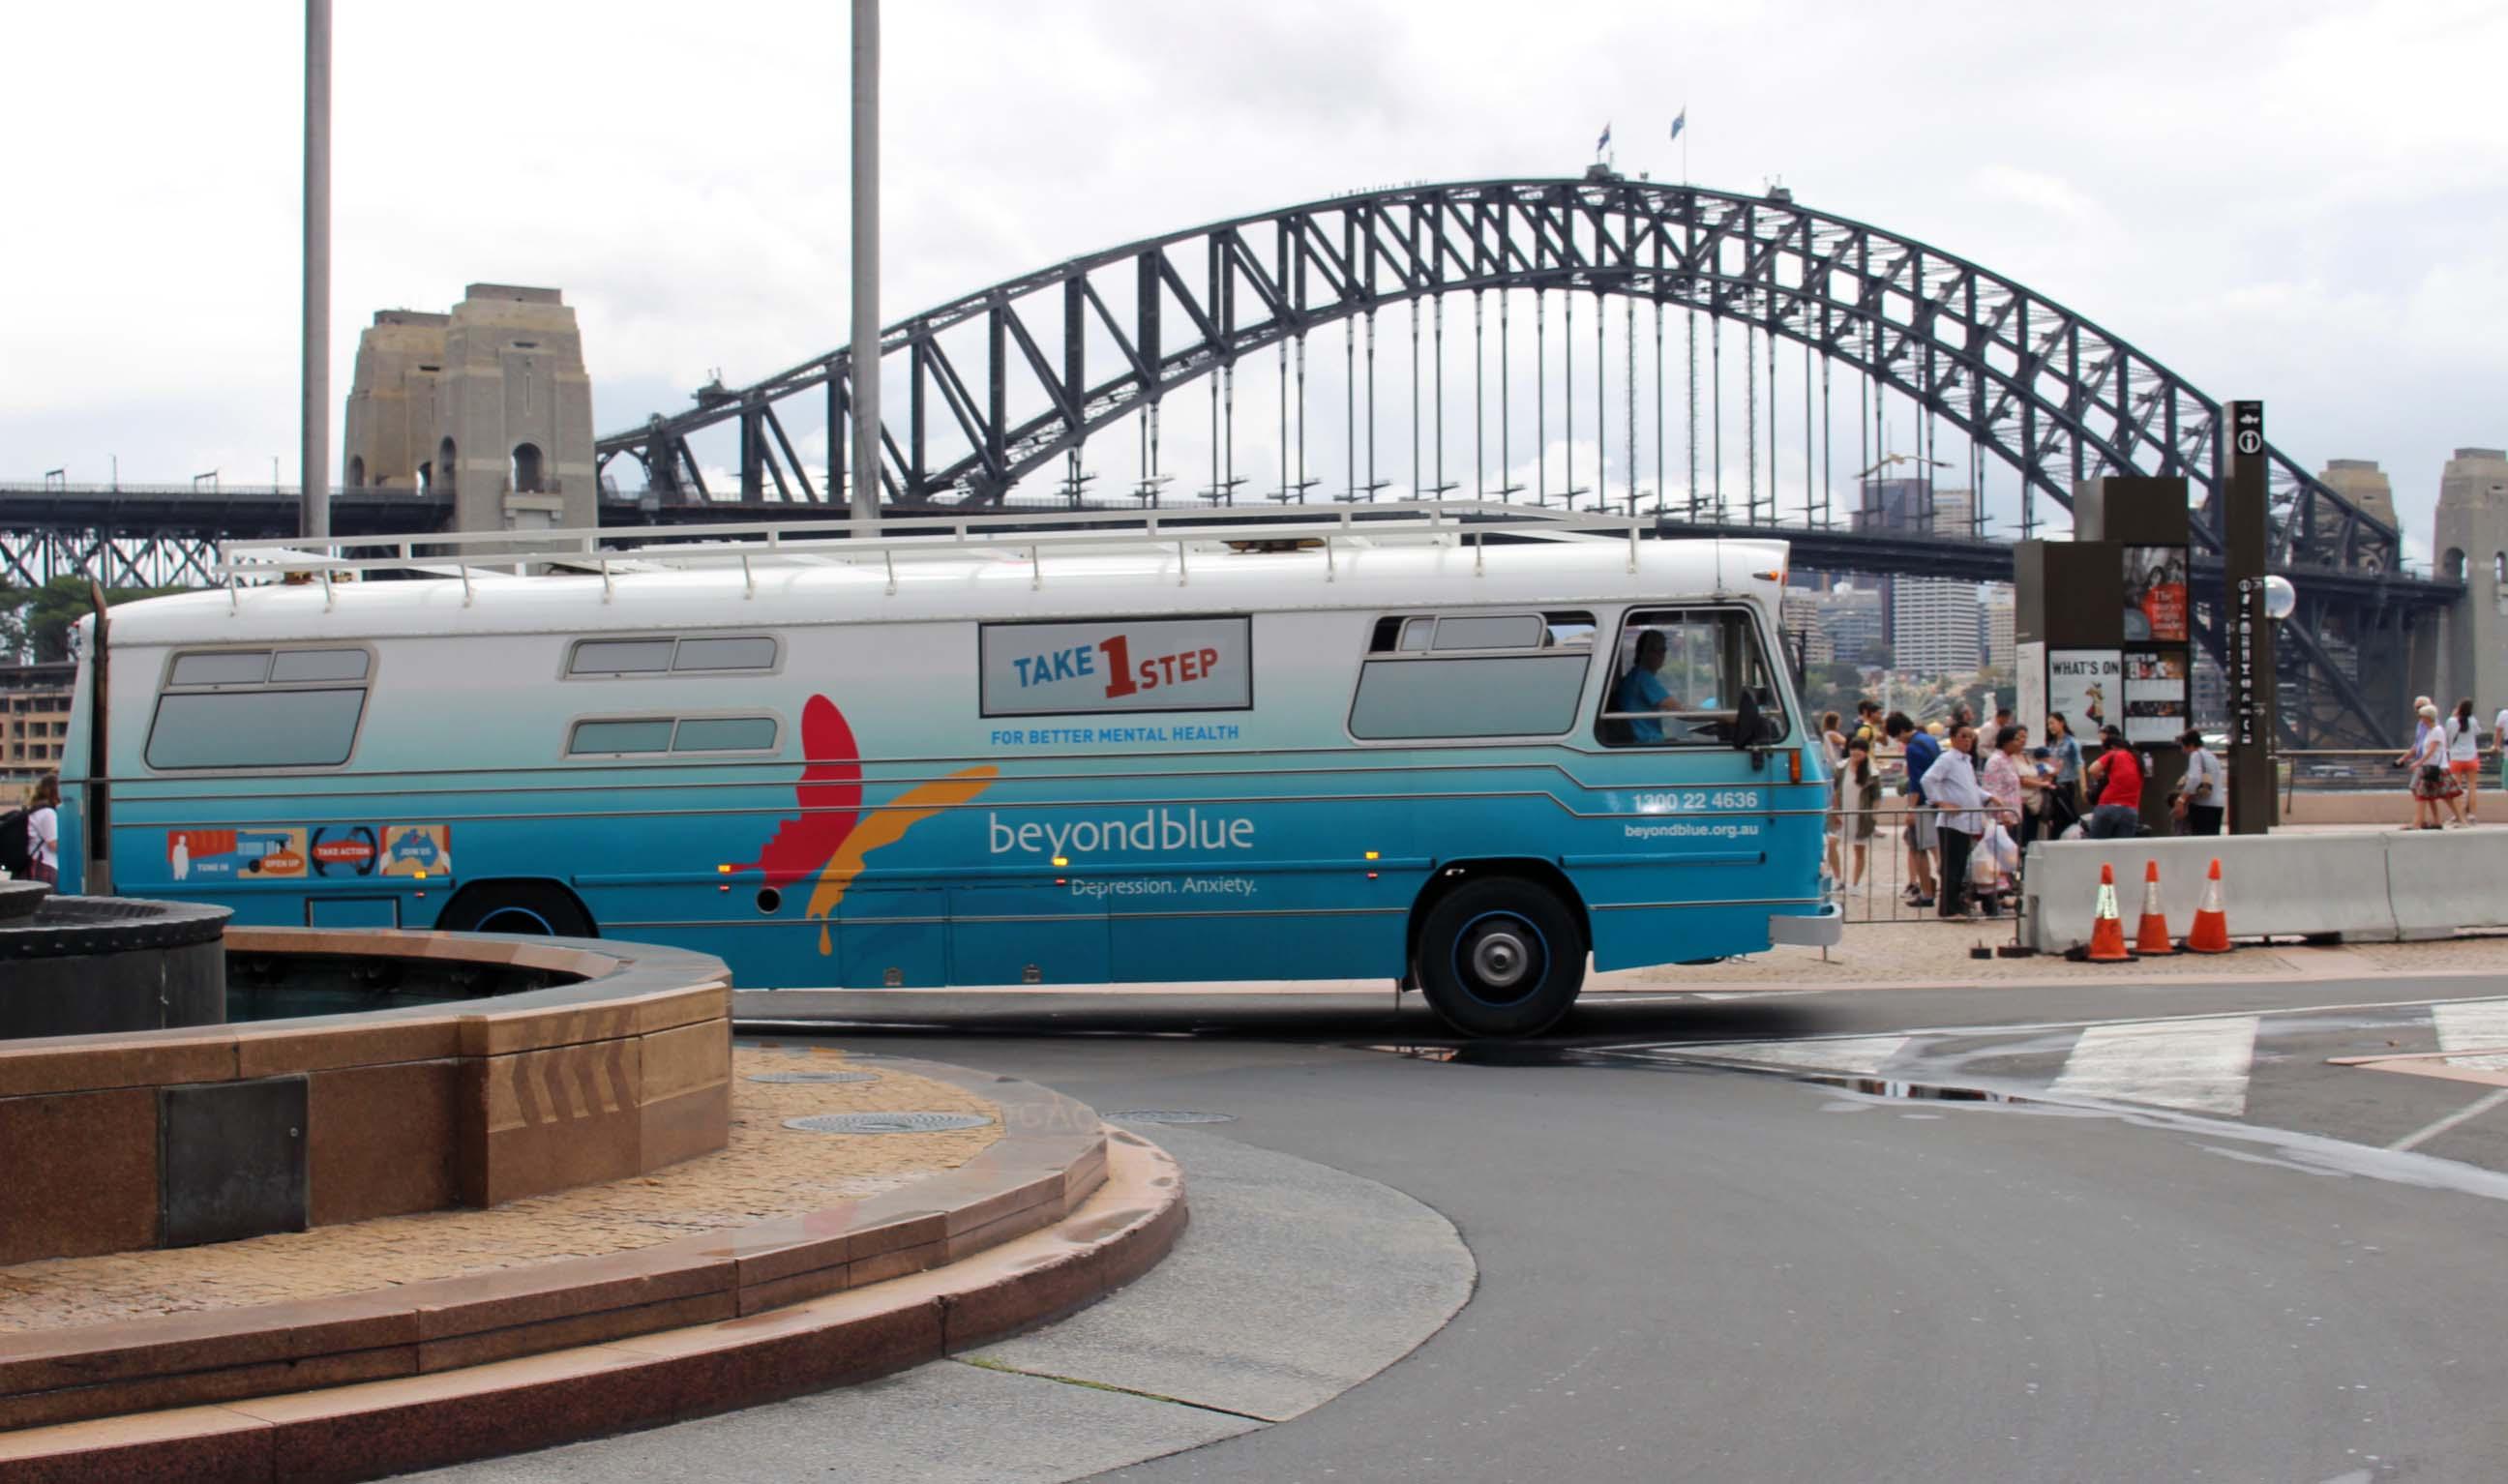 Sightseeing in Sydney!